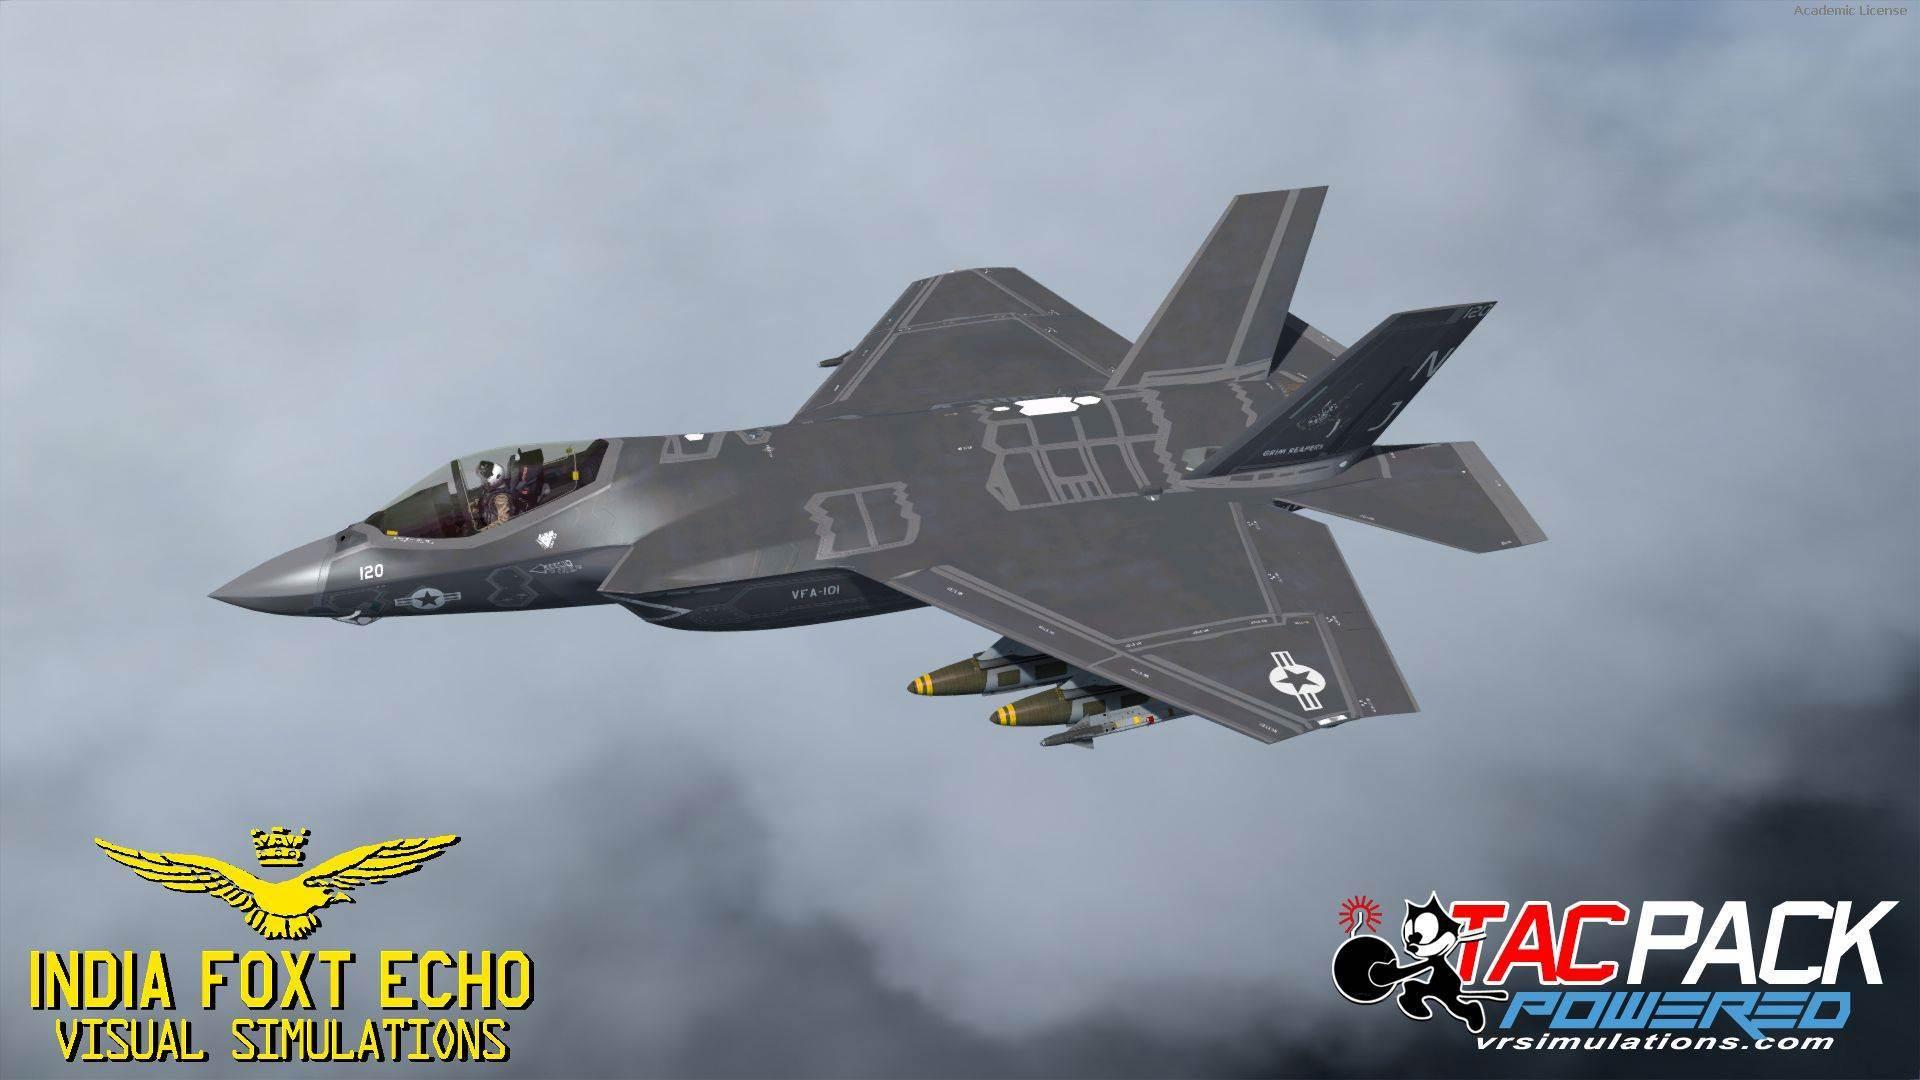 F-35 Lightining II (FSX/P3D)